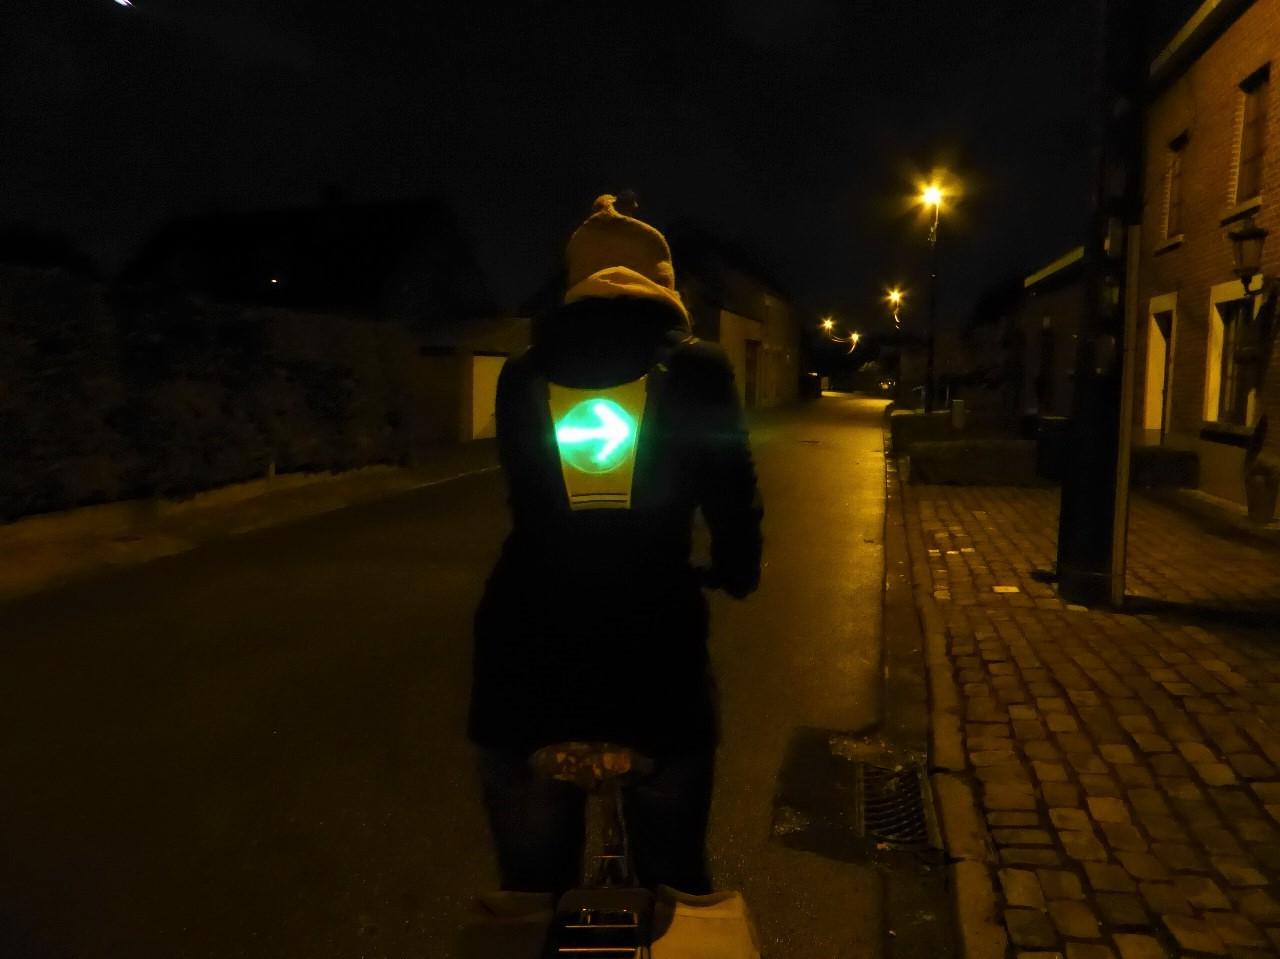 Dofix signalling vest for bikes